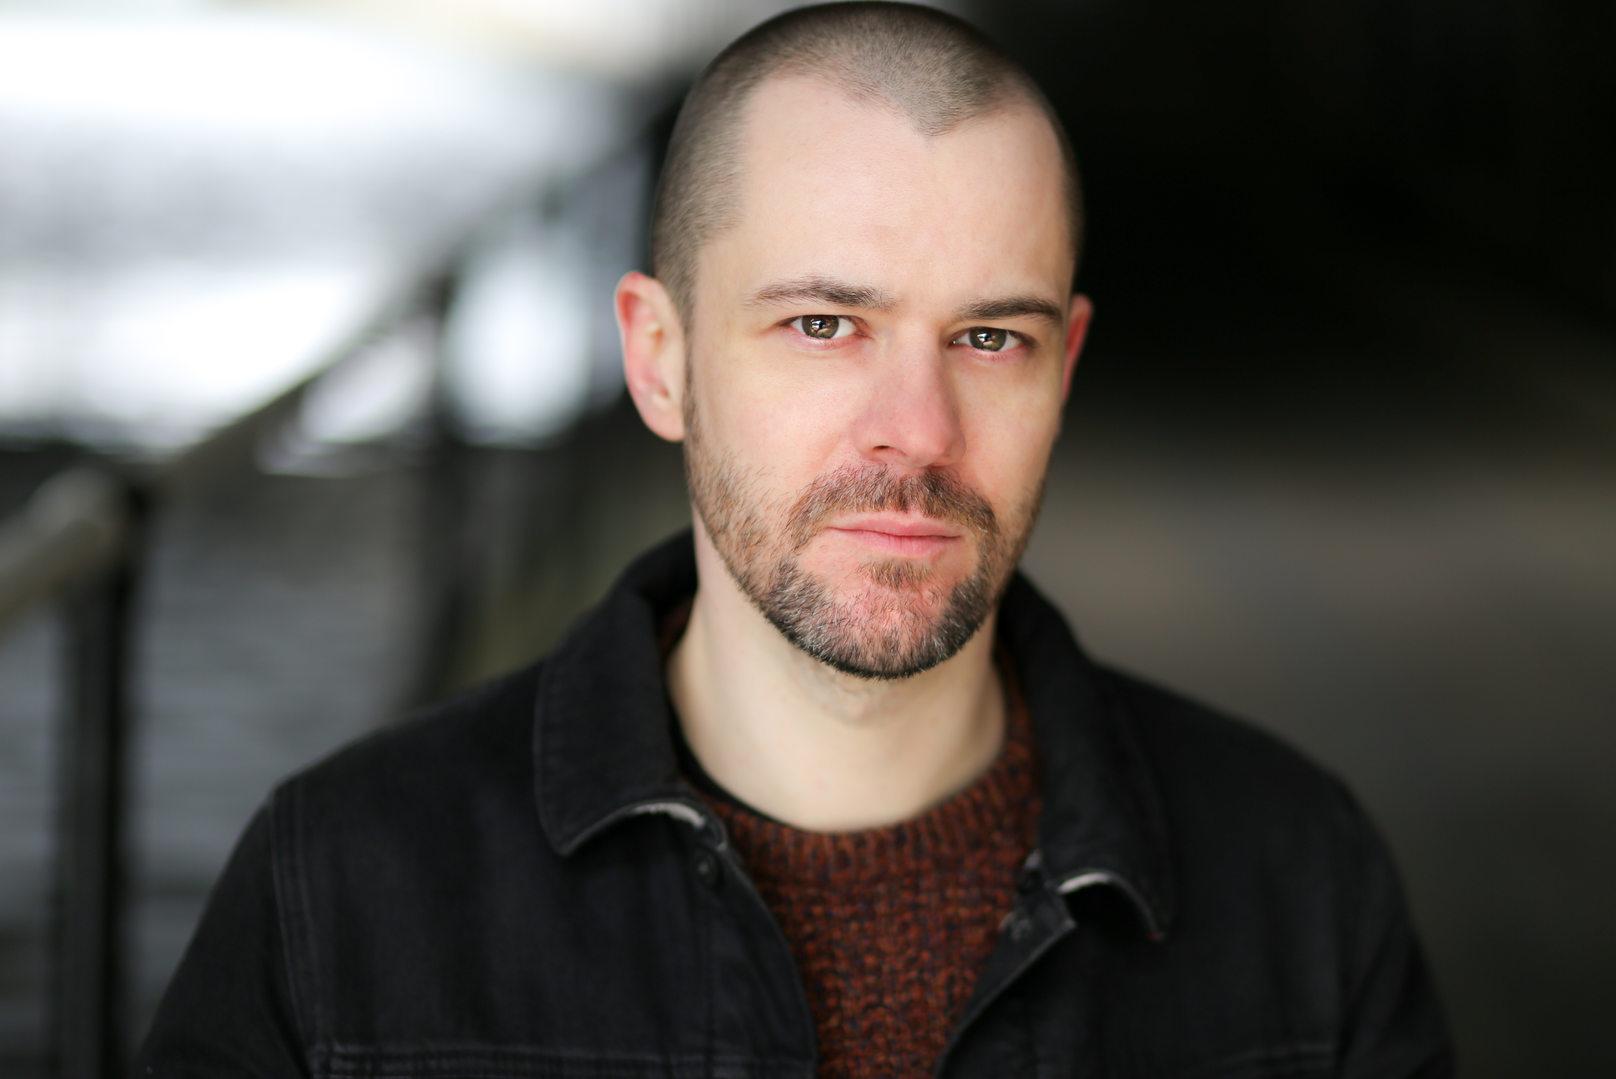 Owen Whitelaw